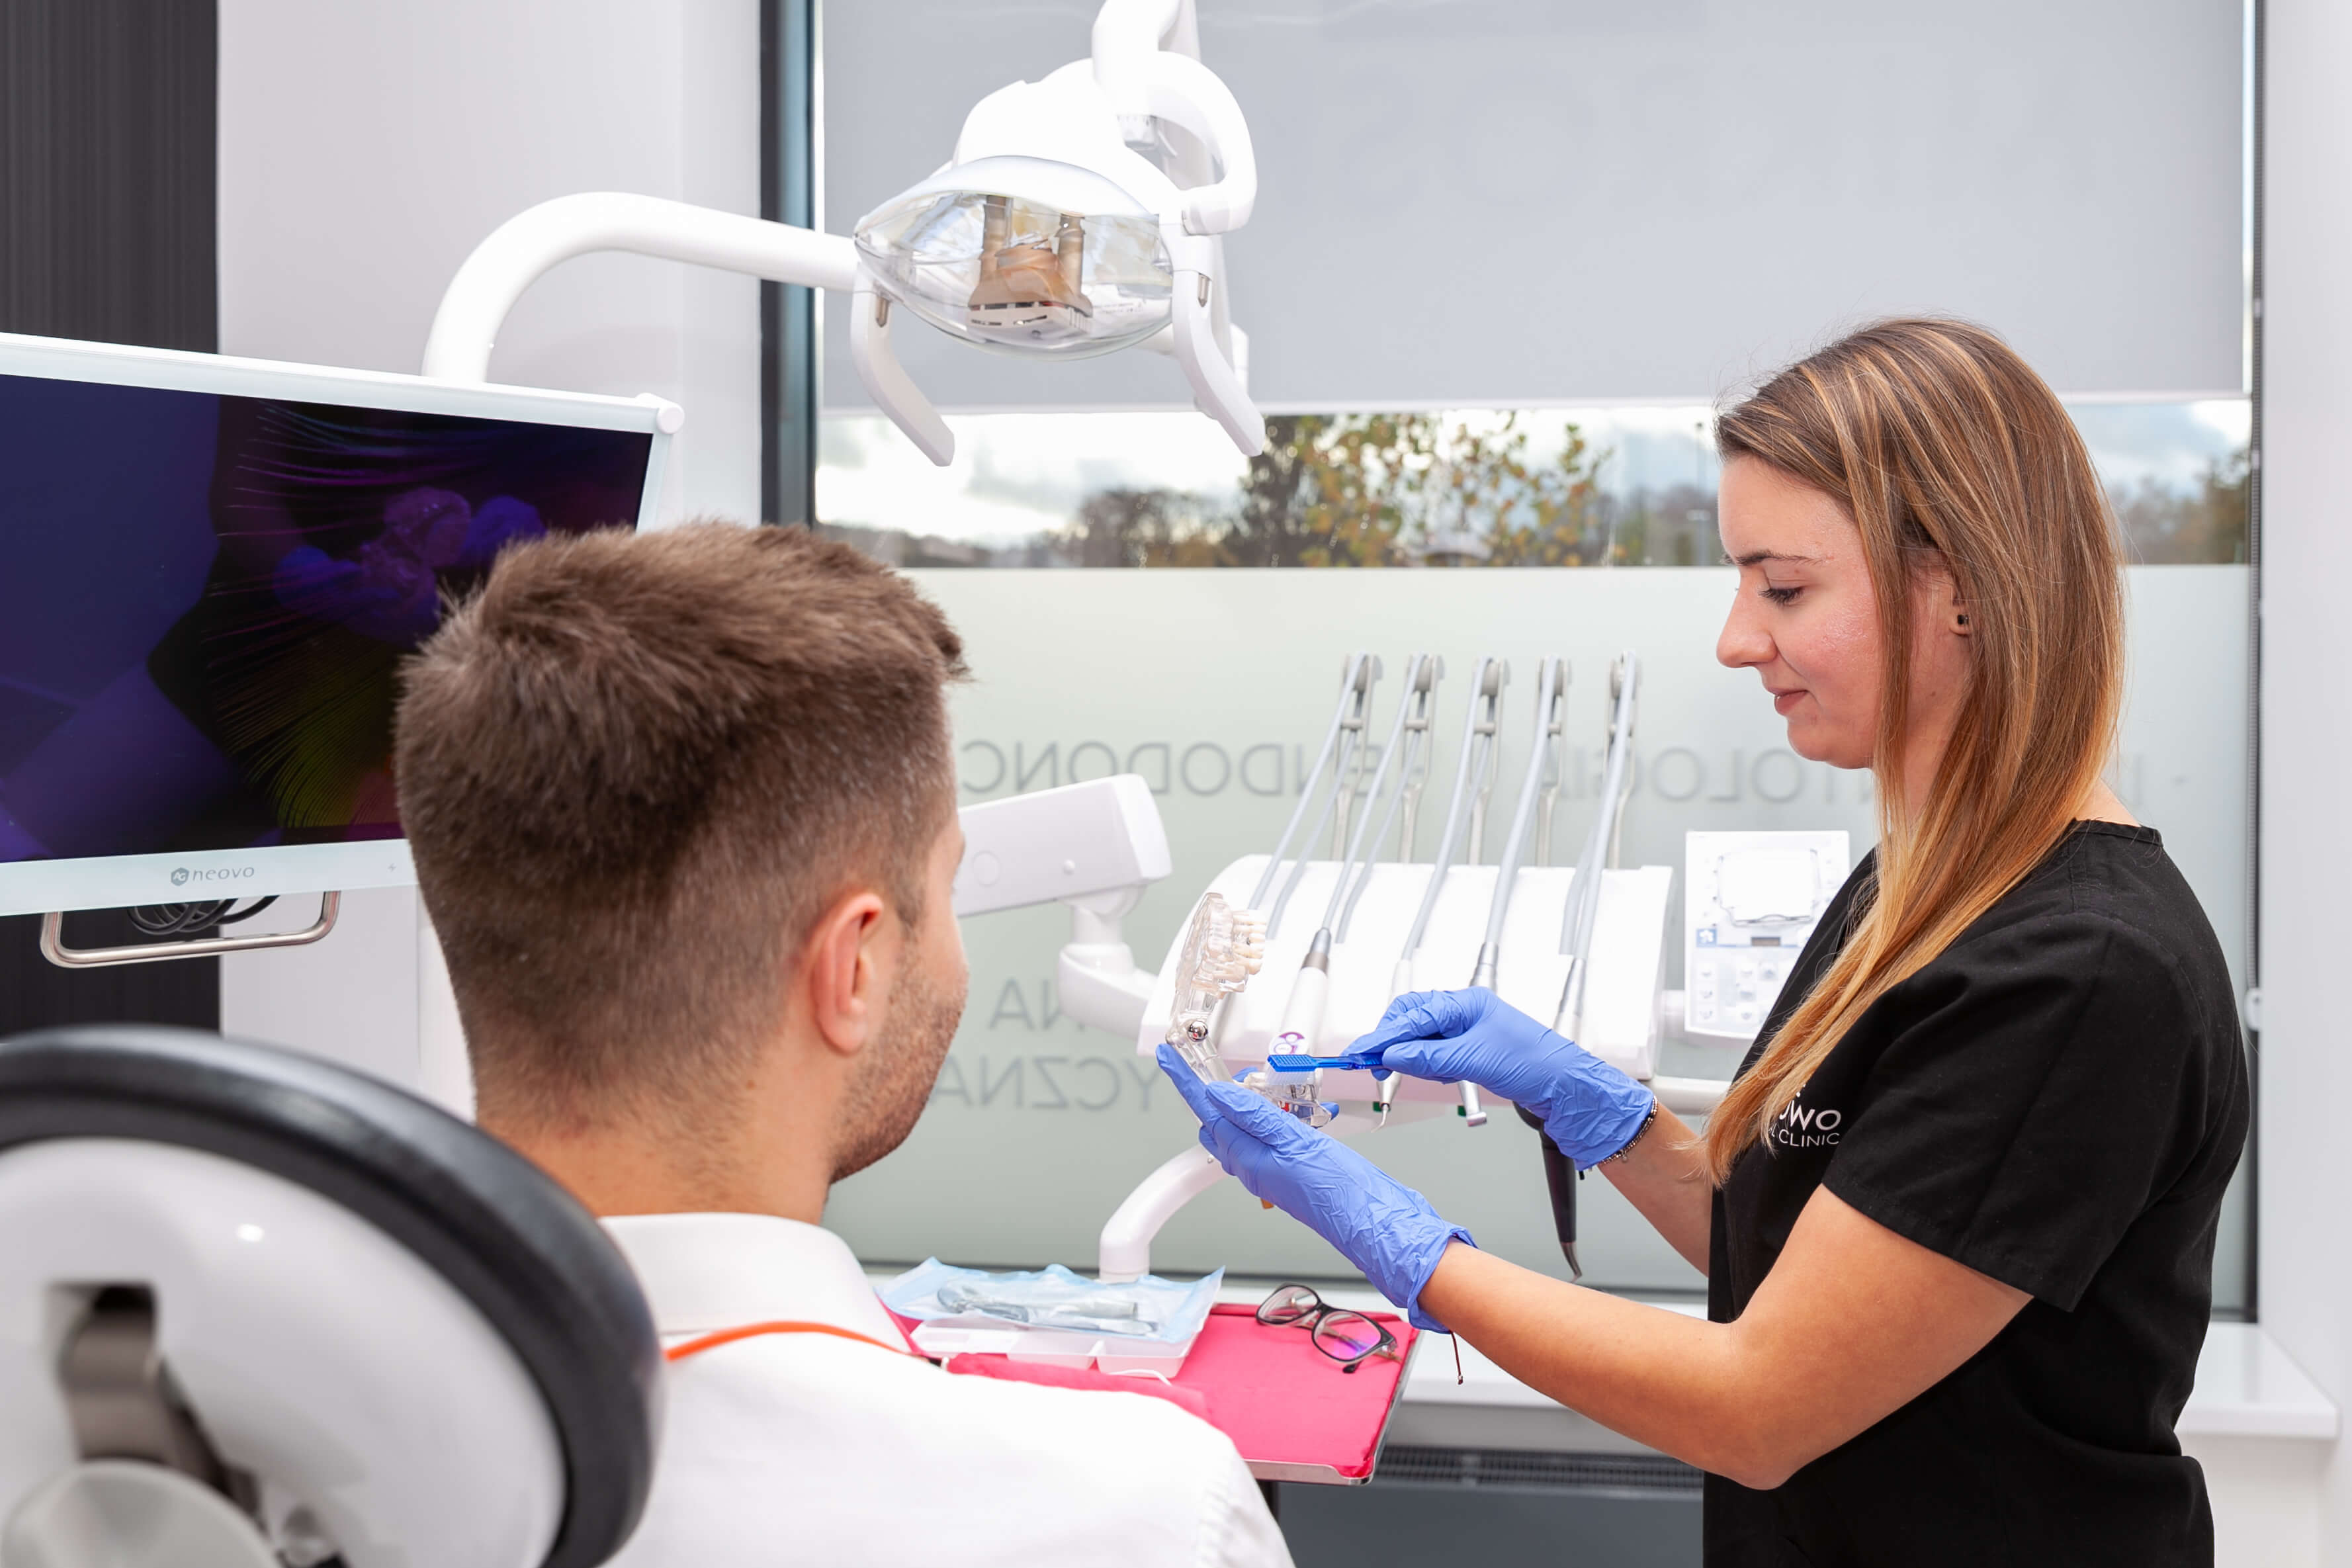 Nowe Orłowo Dental clinic 7 1 - Nowe Orłowo Dental Clinic - a clinic you can trust